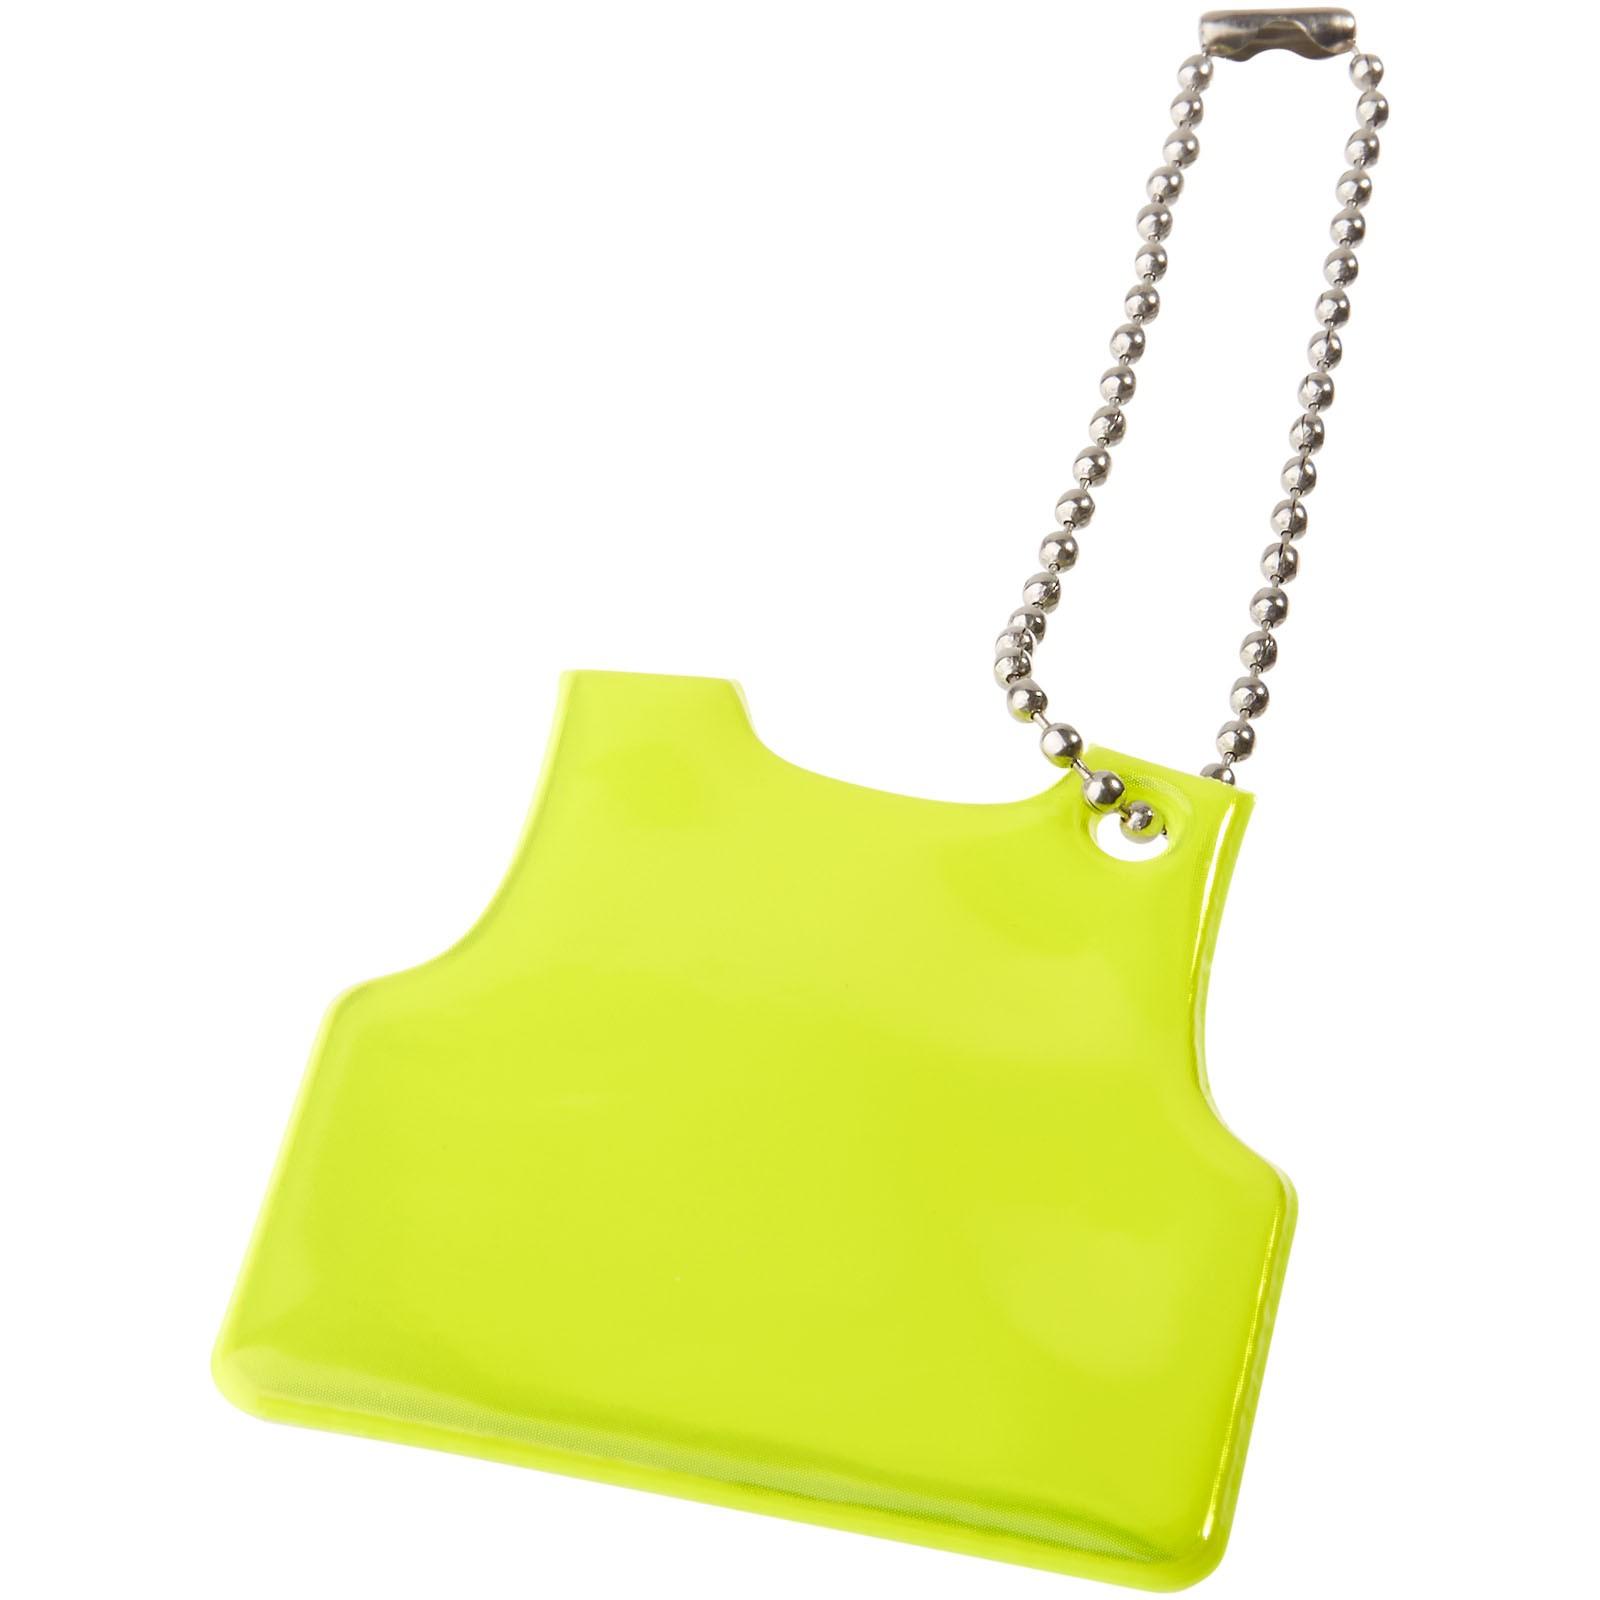 Reflective hanger vest - Yellow